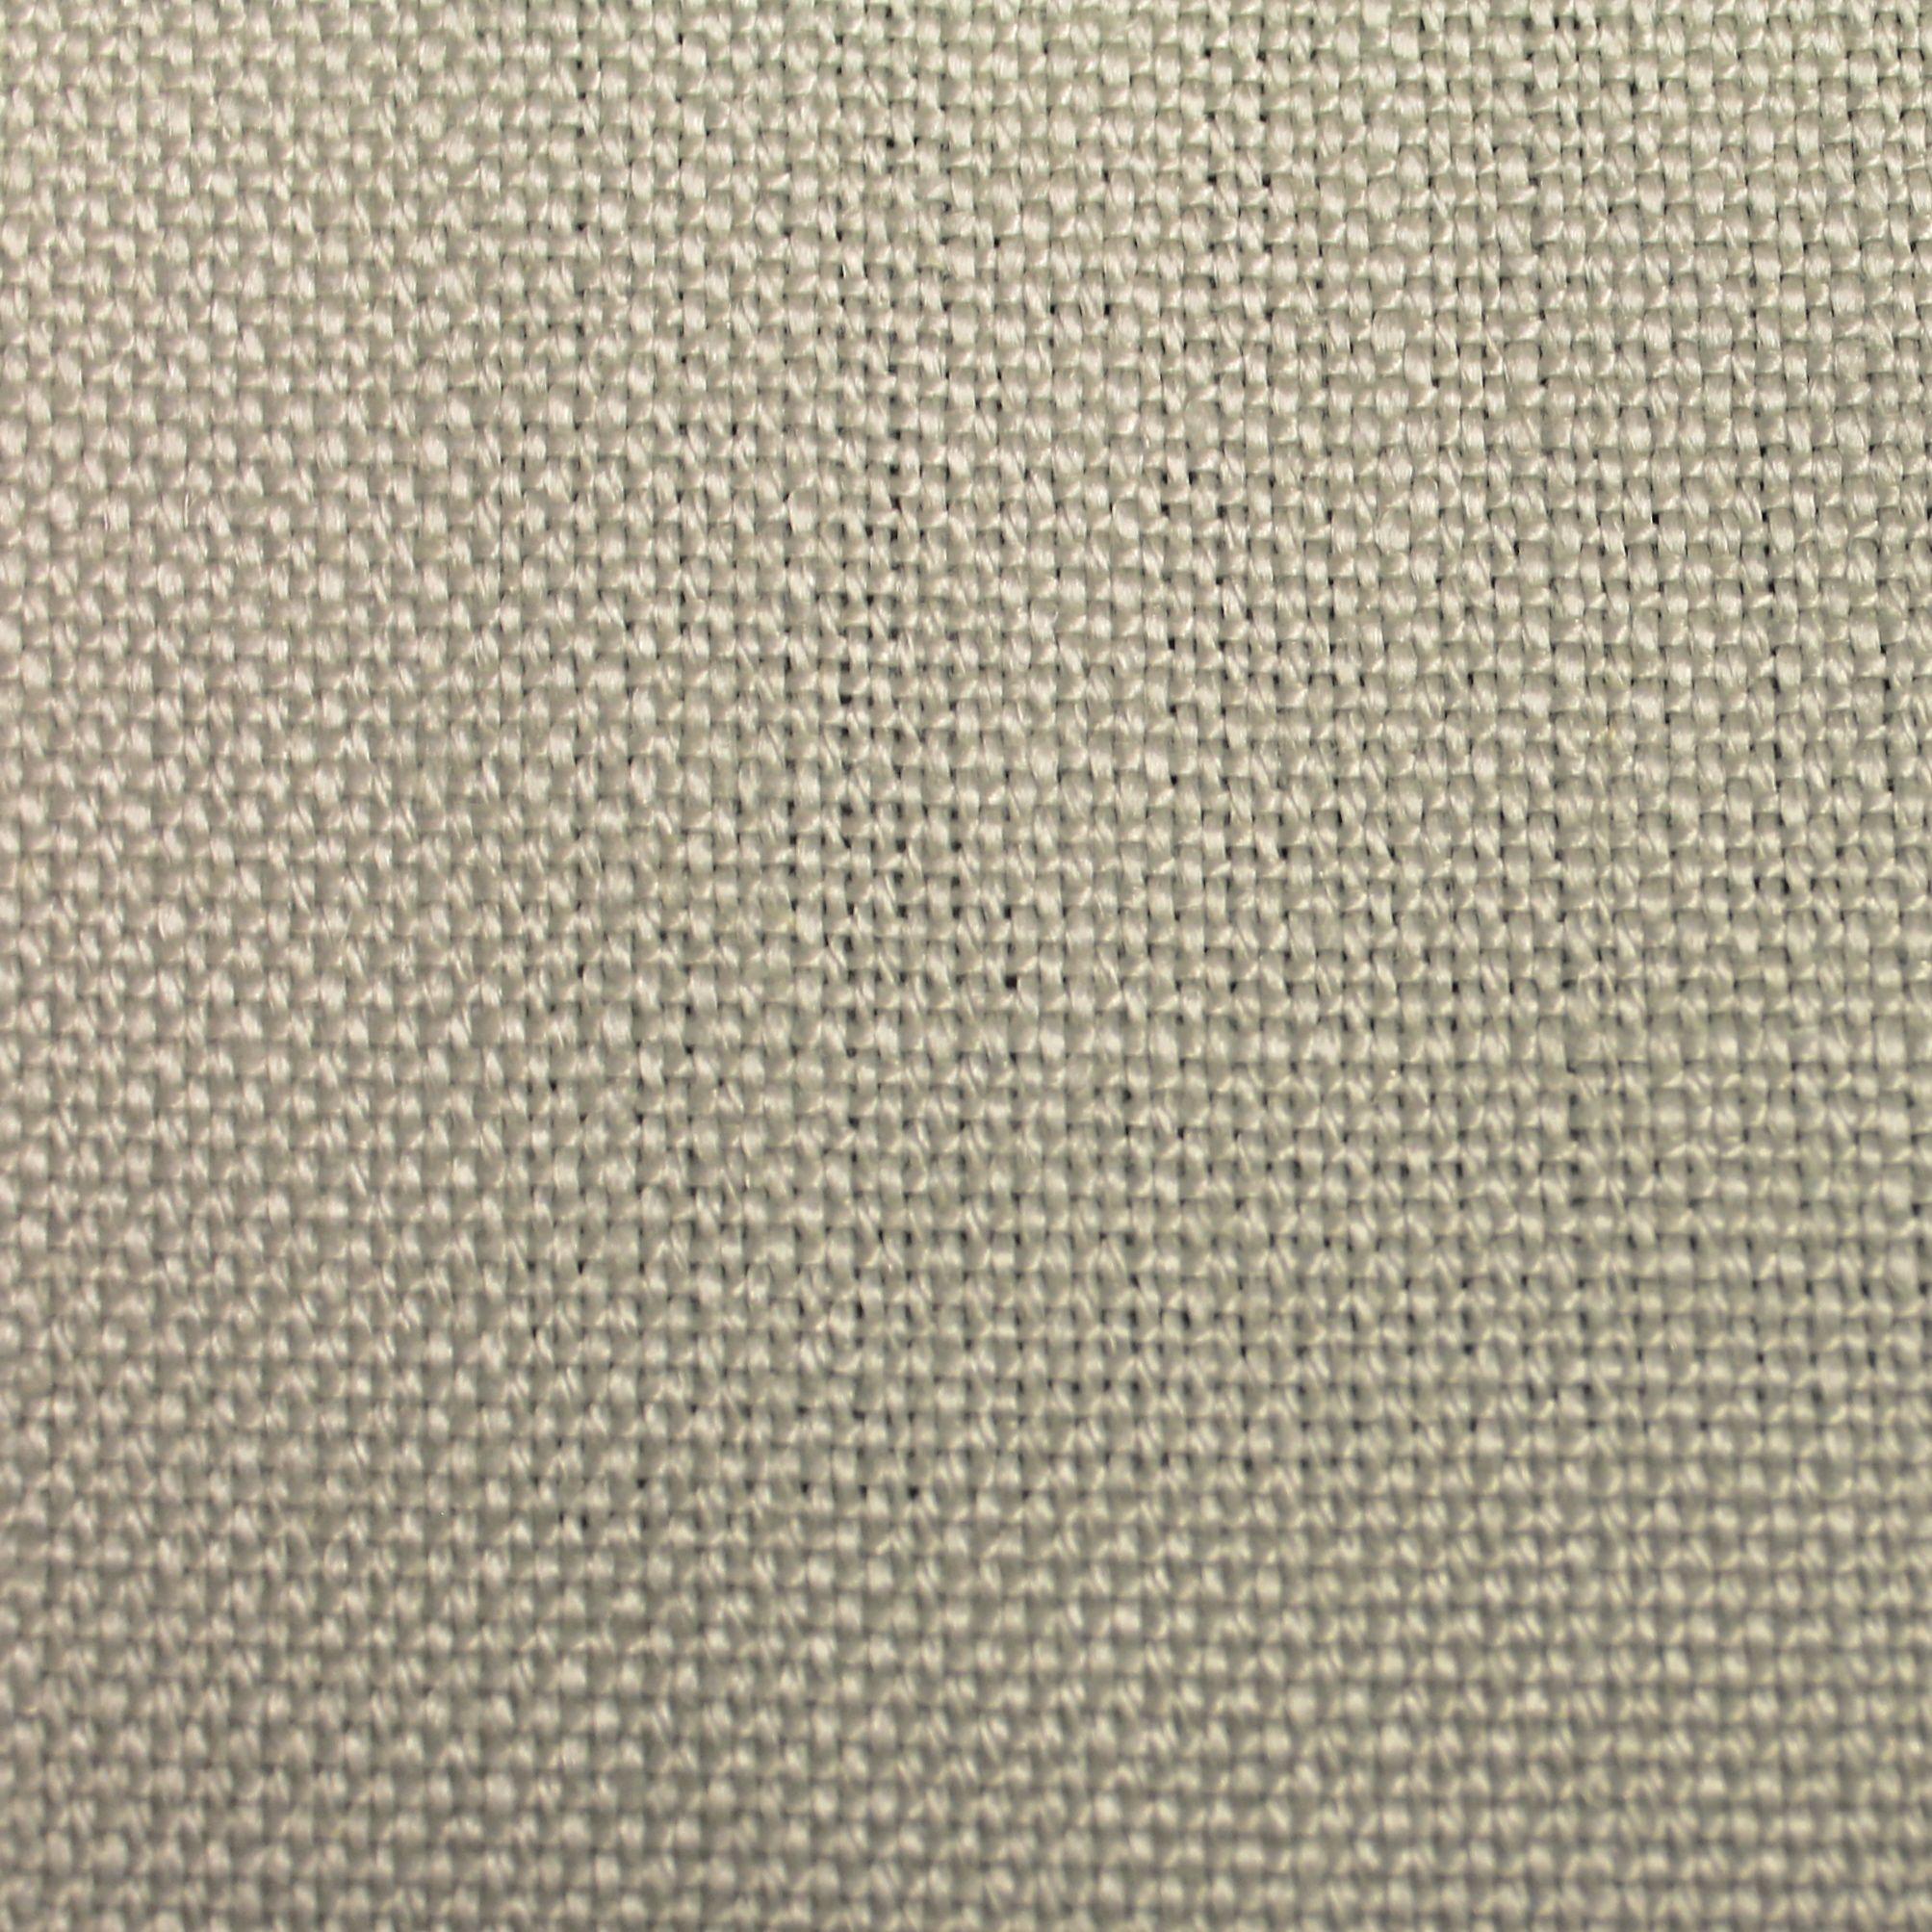 Slubby Linen Pebble